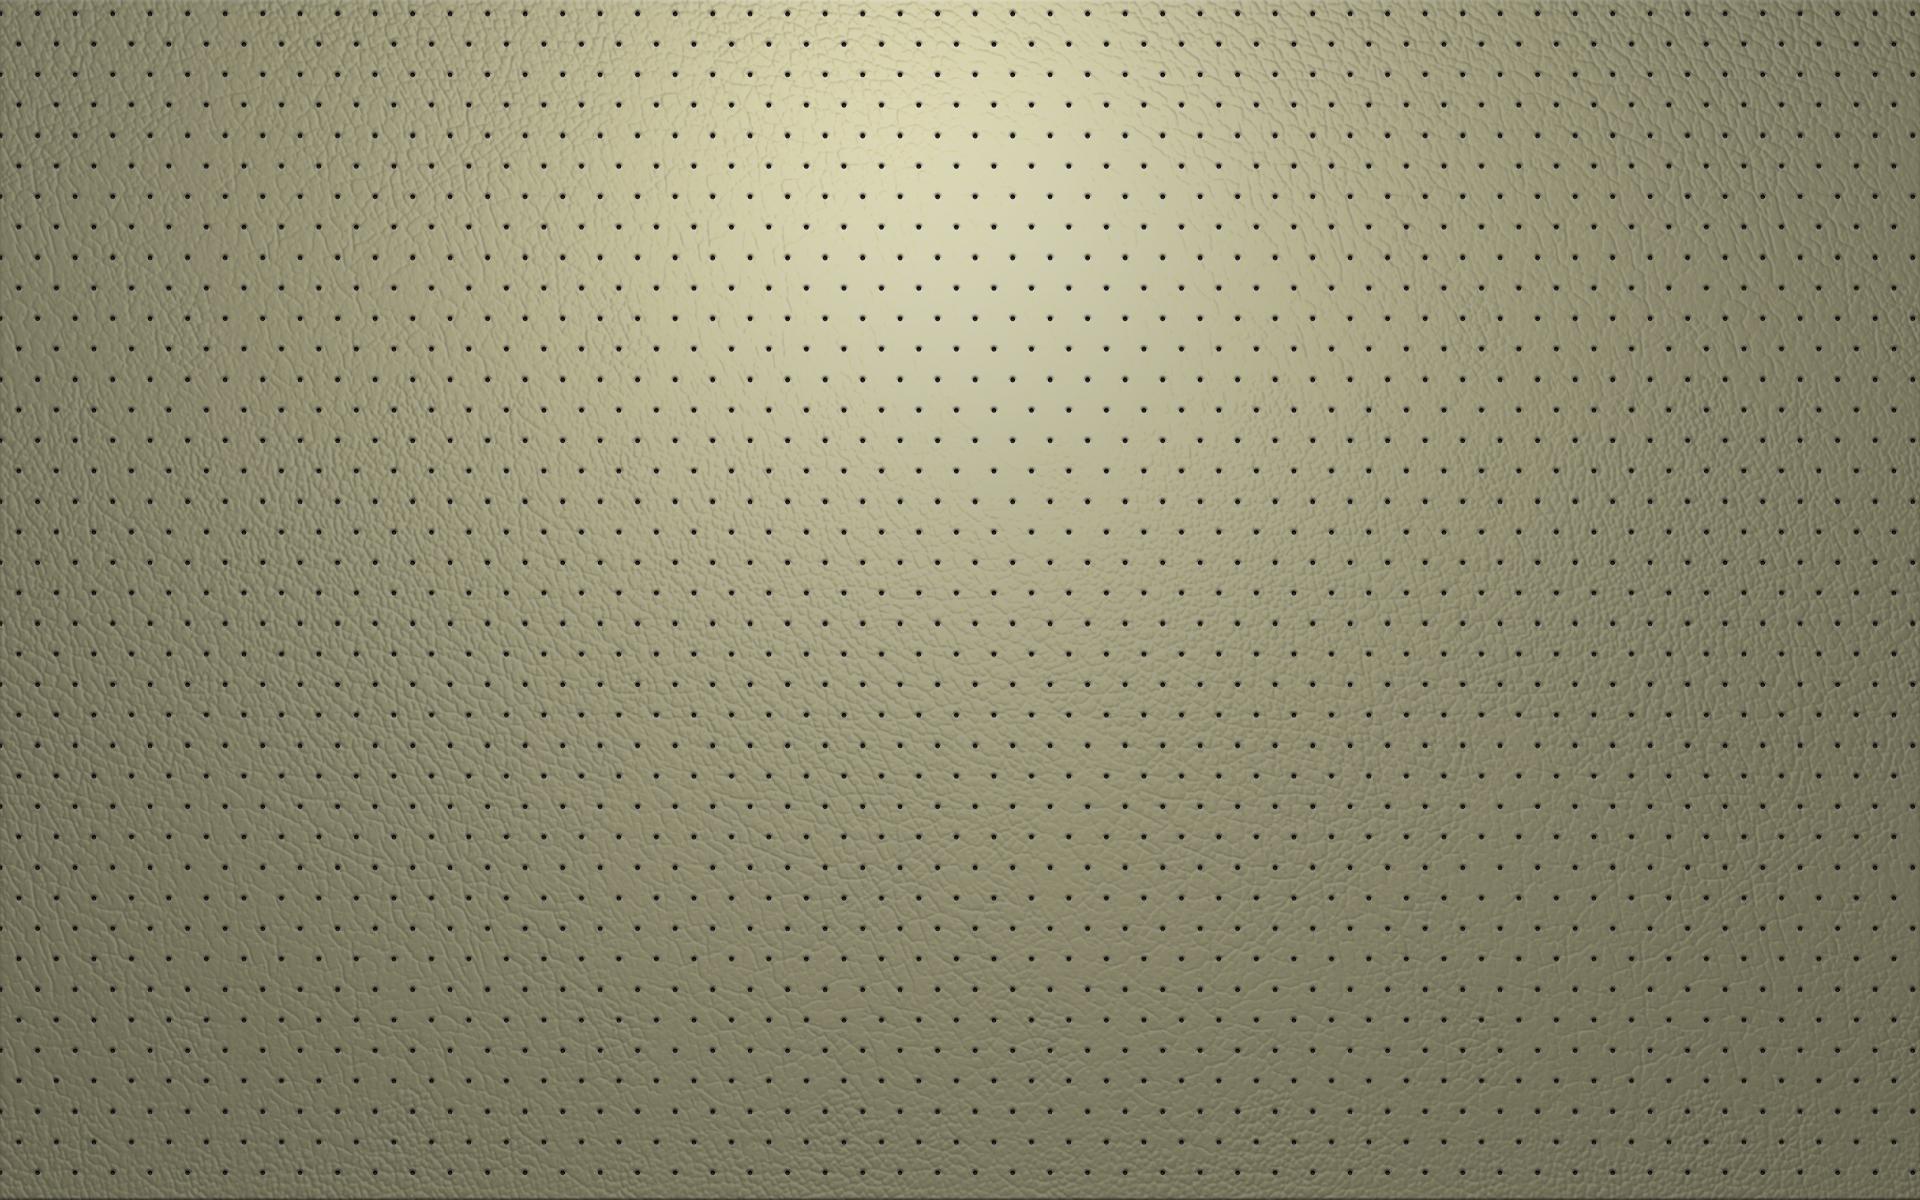 3 Classic Hd Wallpapers Backgrounds Wallpaper Abyss HD Wallpapers Download Free Images Wallpaper [1000image.com]